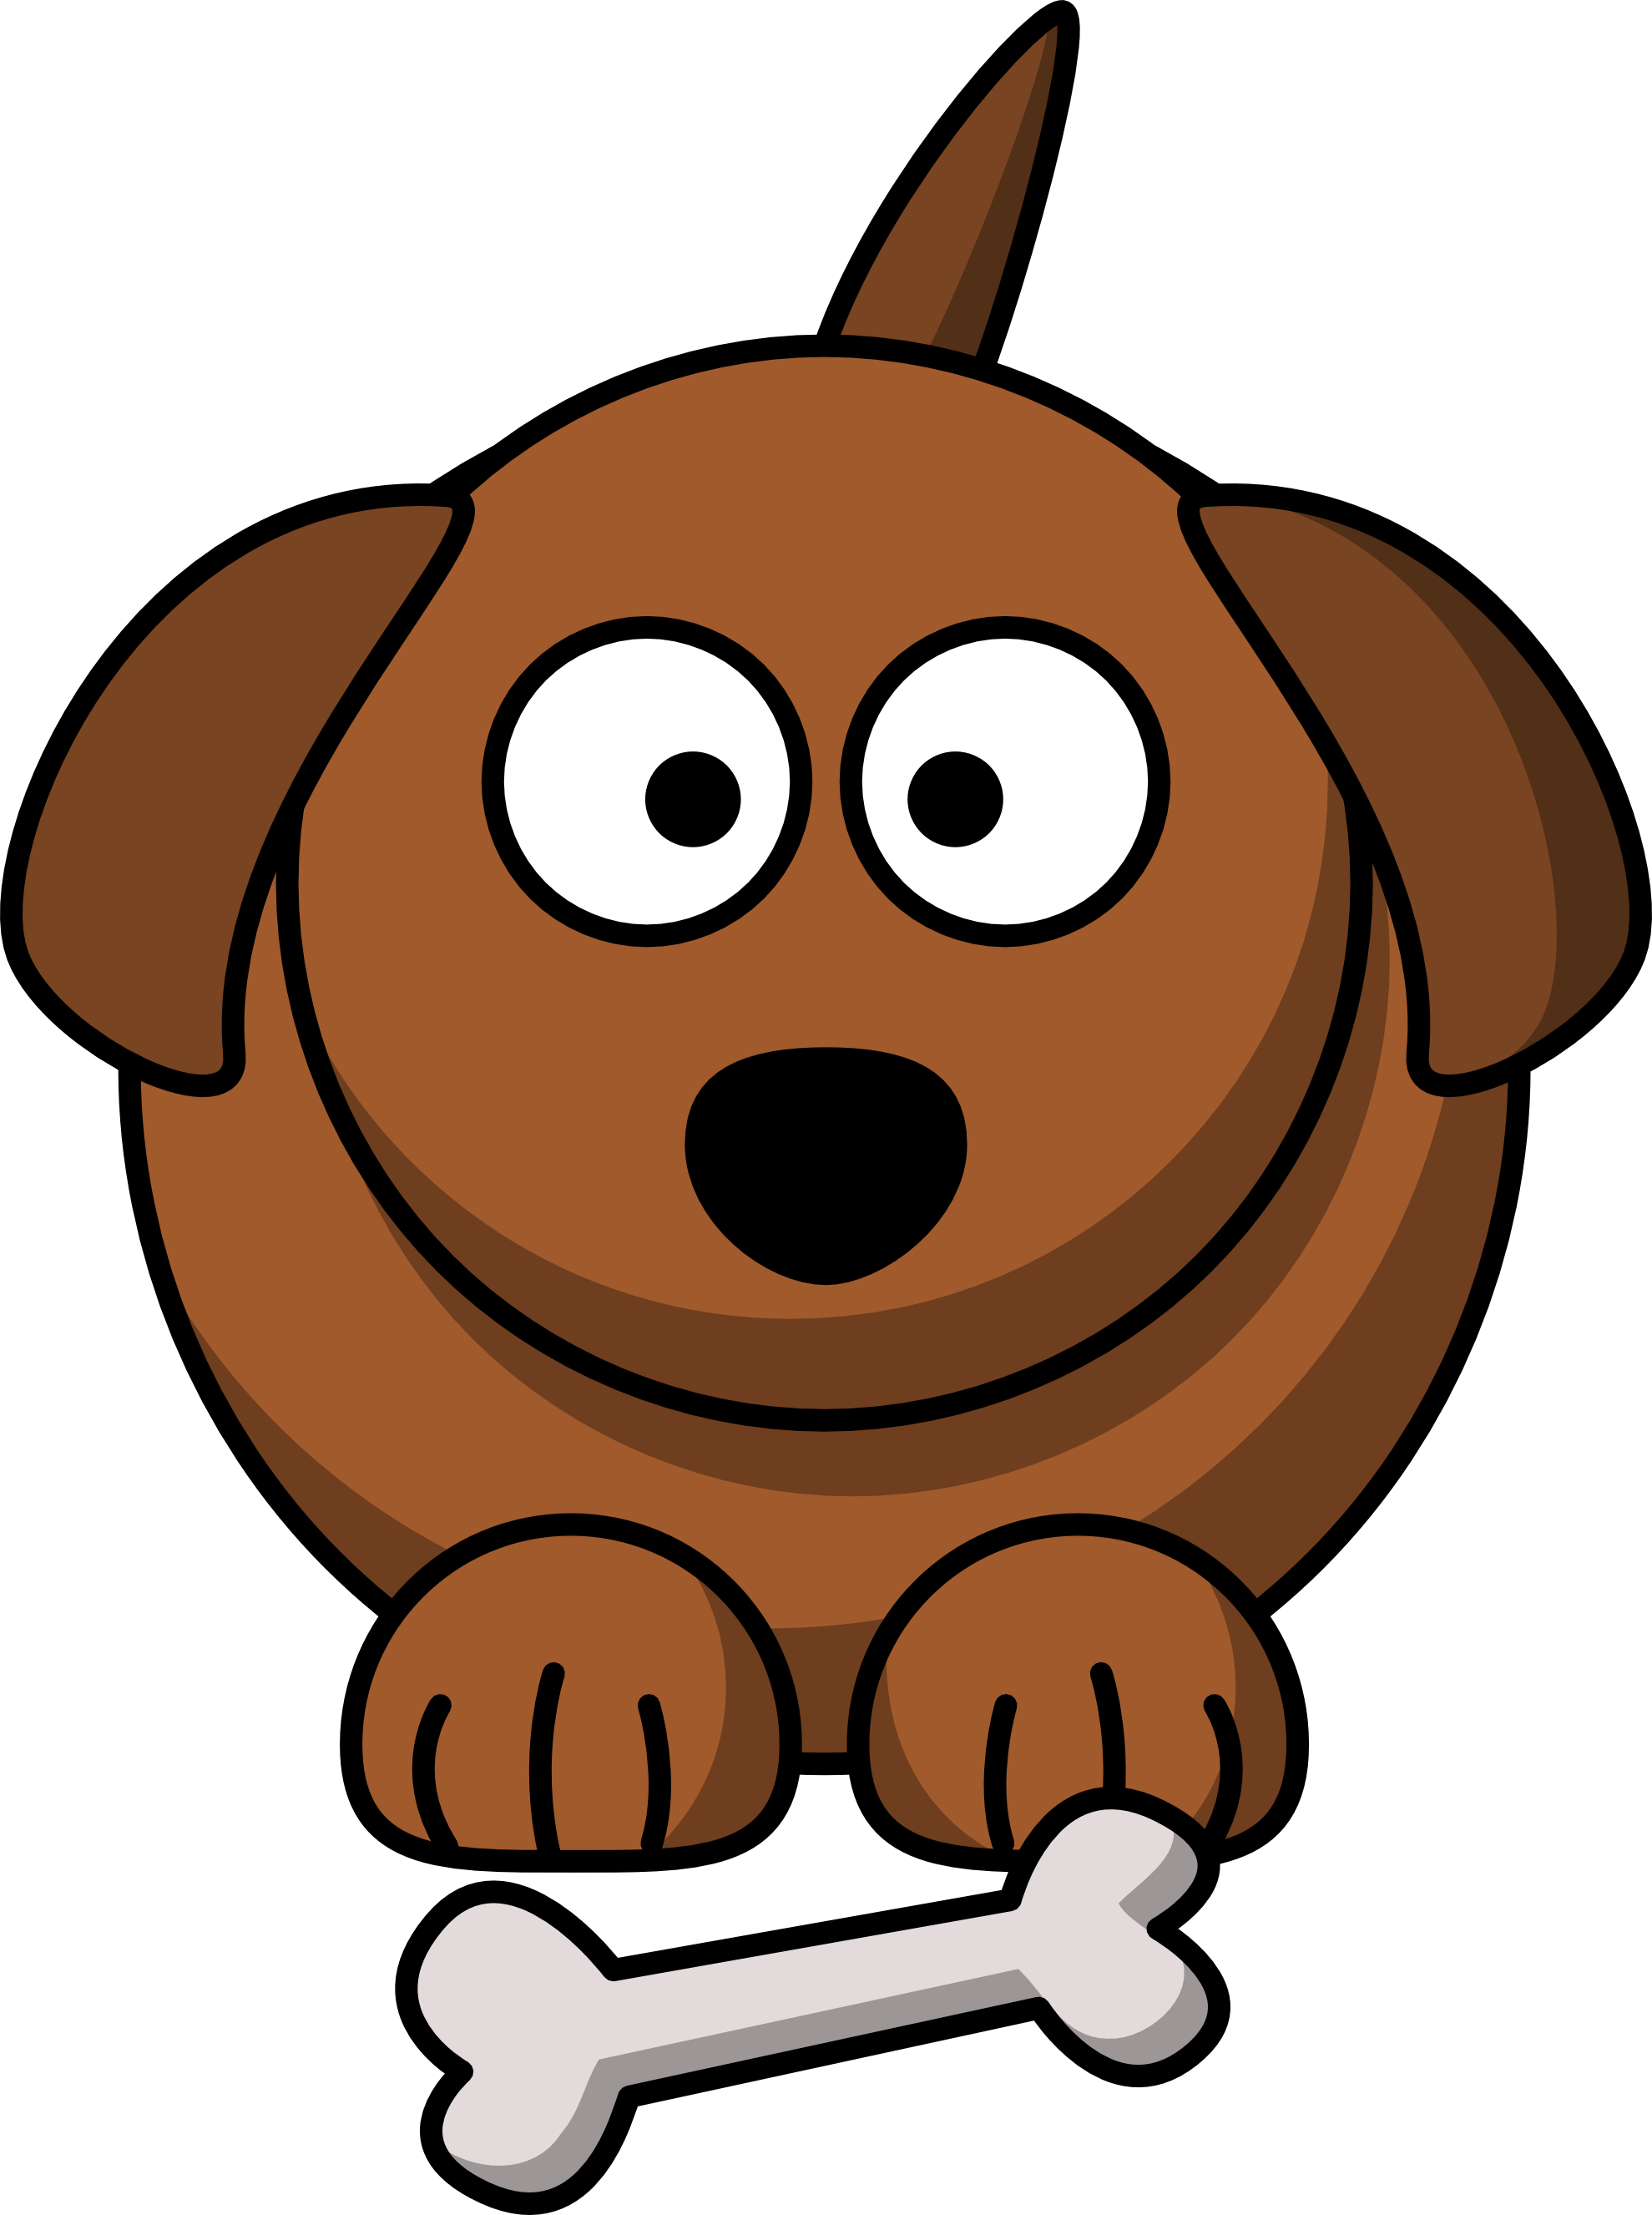 Stuffed Animal Clipart.